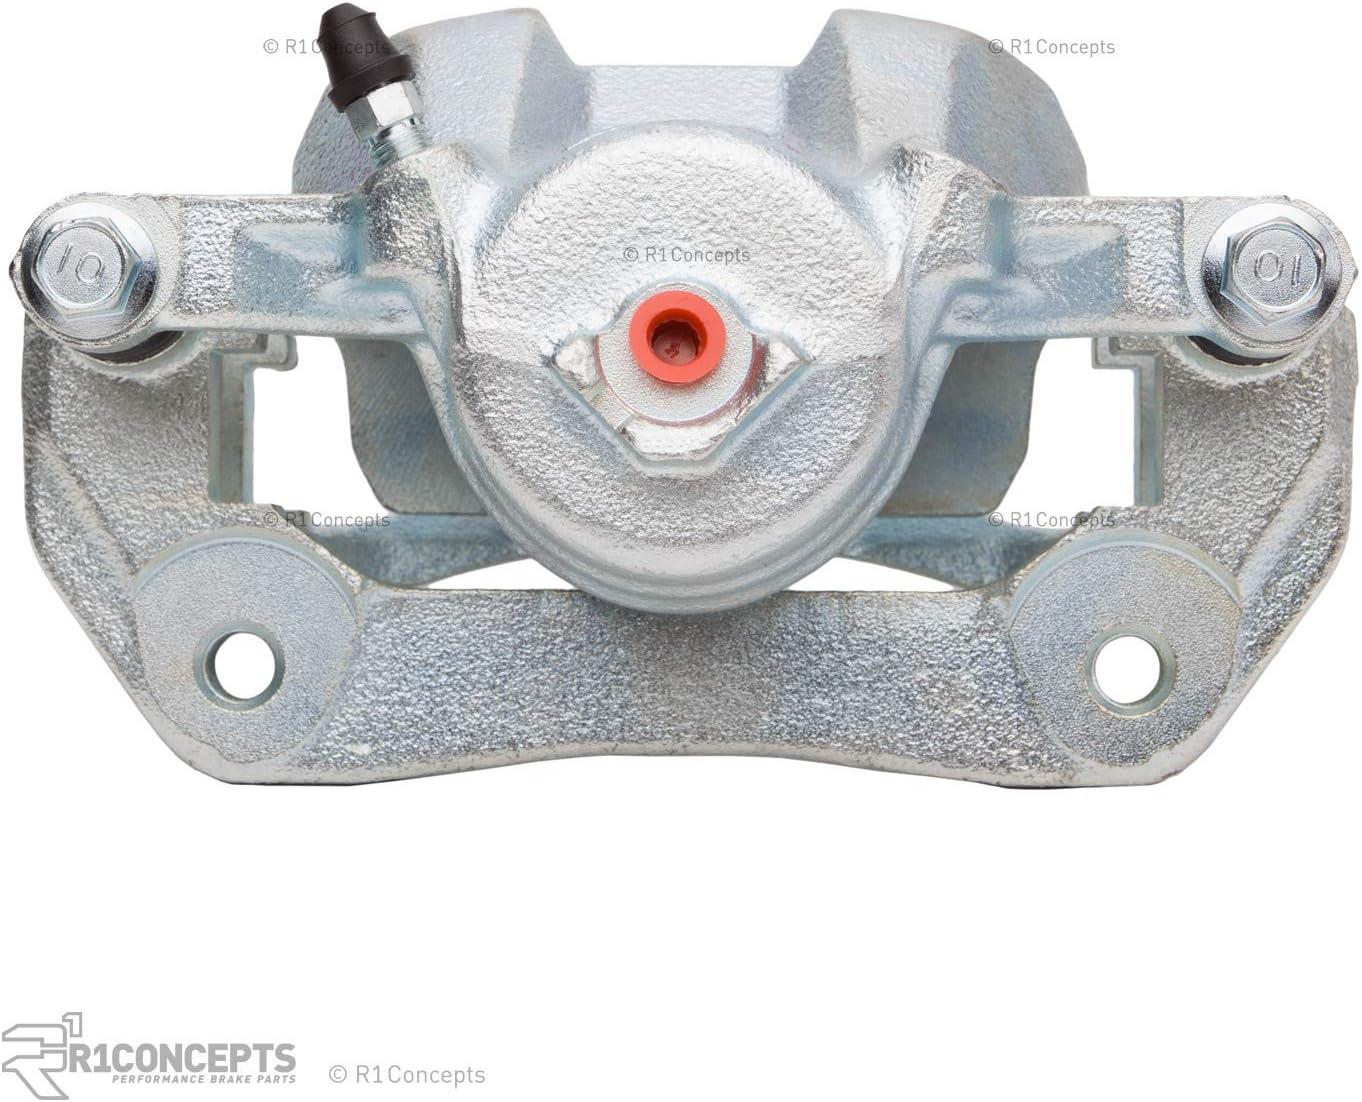 For 2013-2015 Honda Accord Front Left Driver Side Zinc Disc Brake Caliper